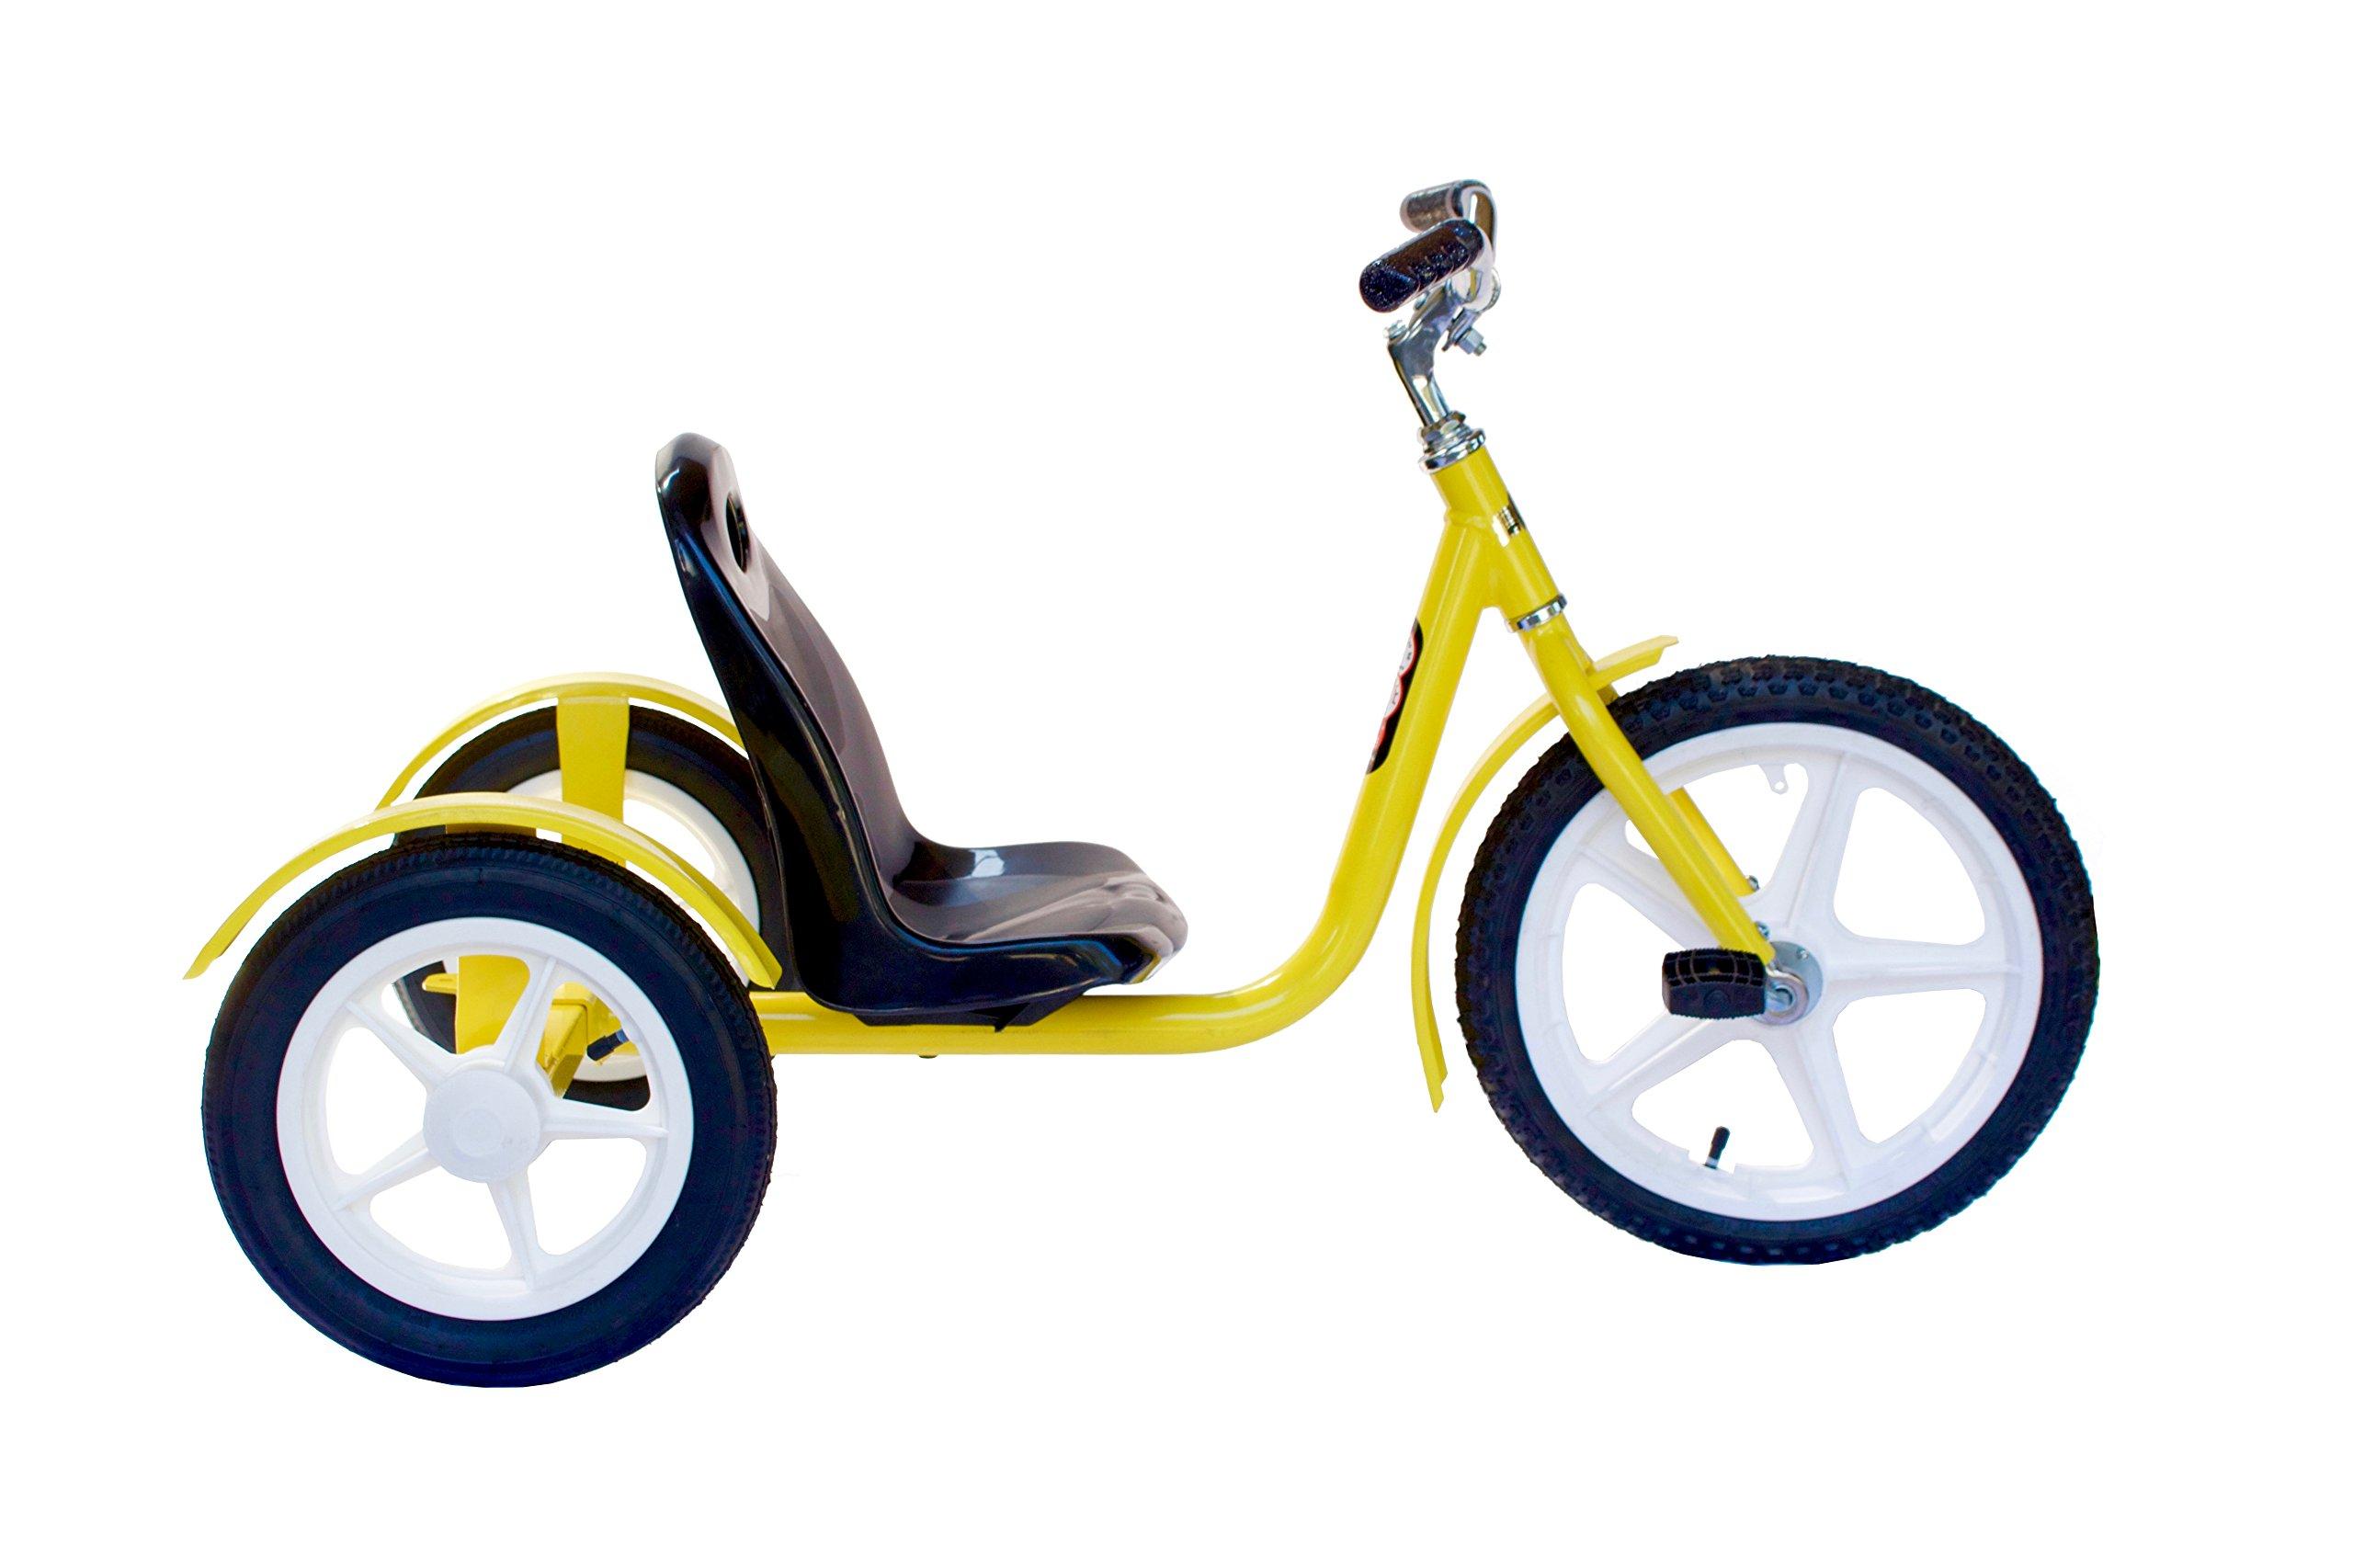 Groffdale Chopper Kid's Deluxe Yellow Trike